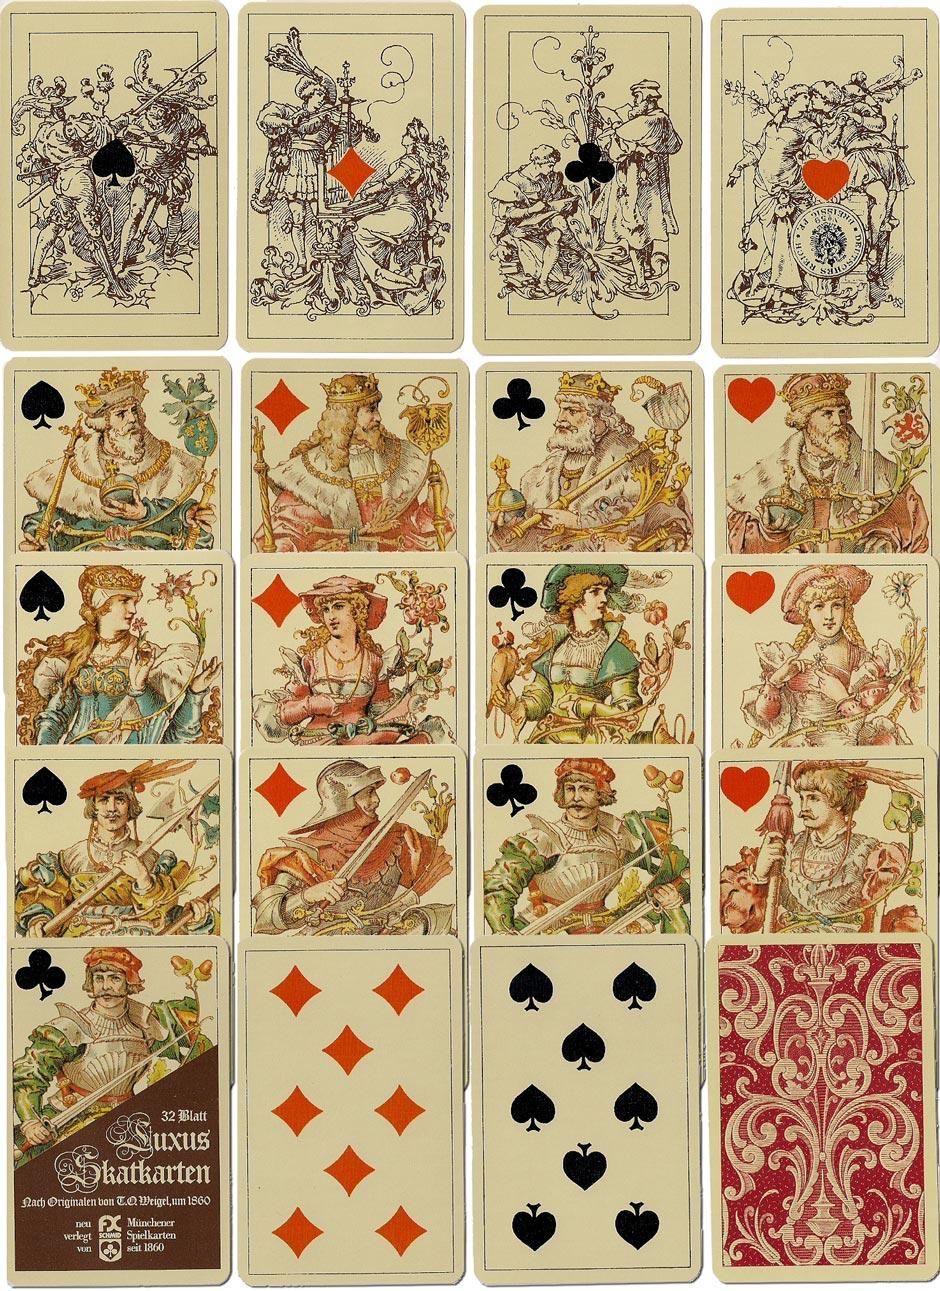 T.O.Weigel's 'Luxus Skatkarten' (c.1880), reprinted in facsimile by F.X.Schmid, Munich, 1981